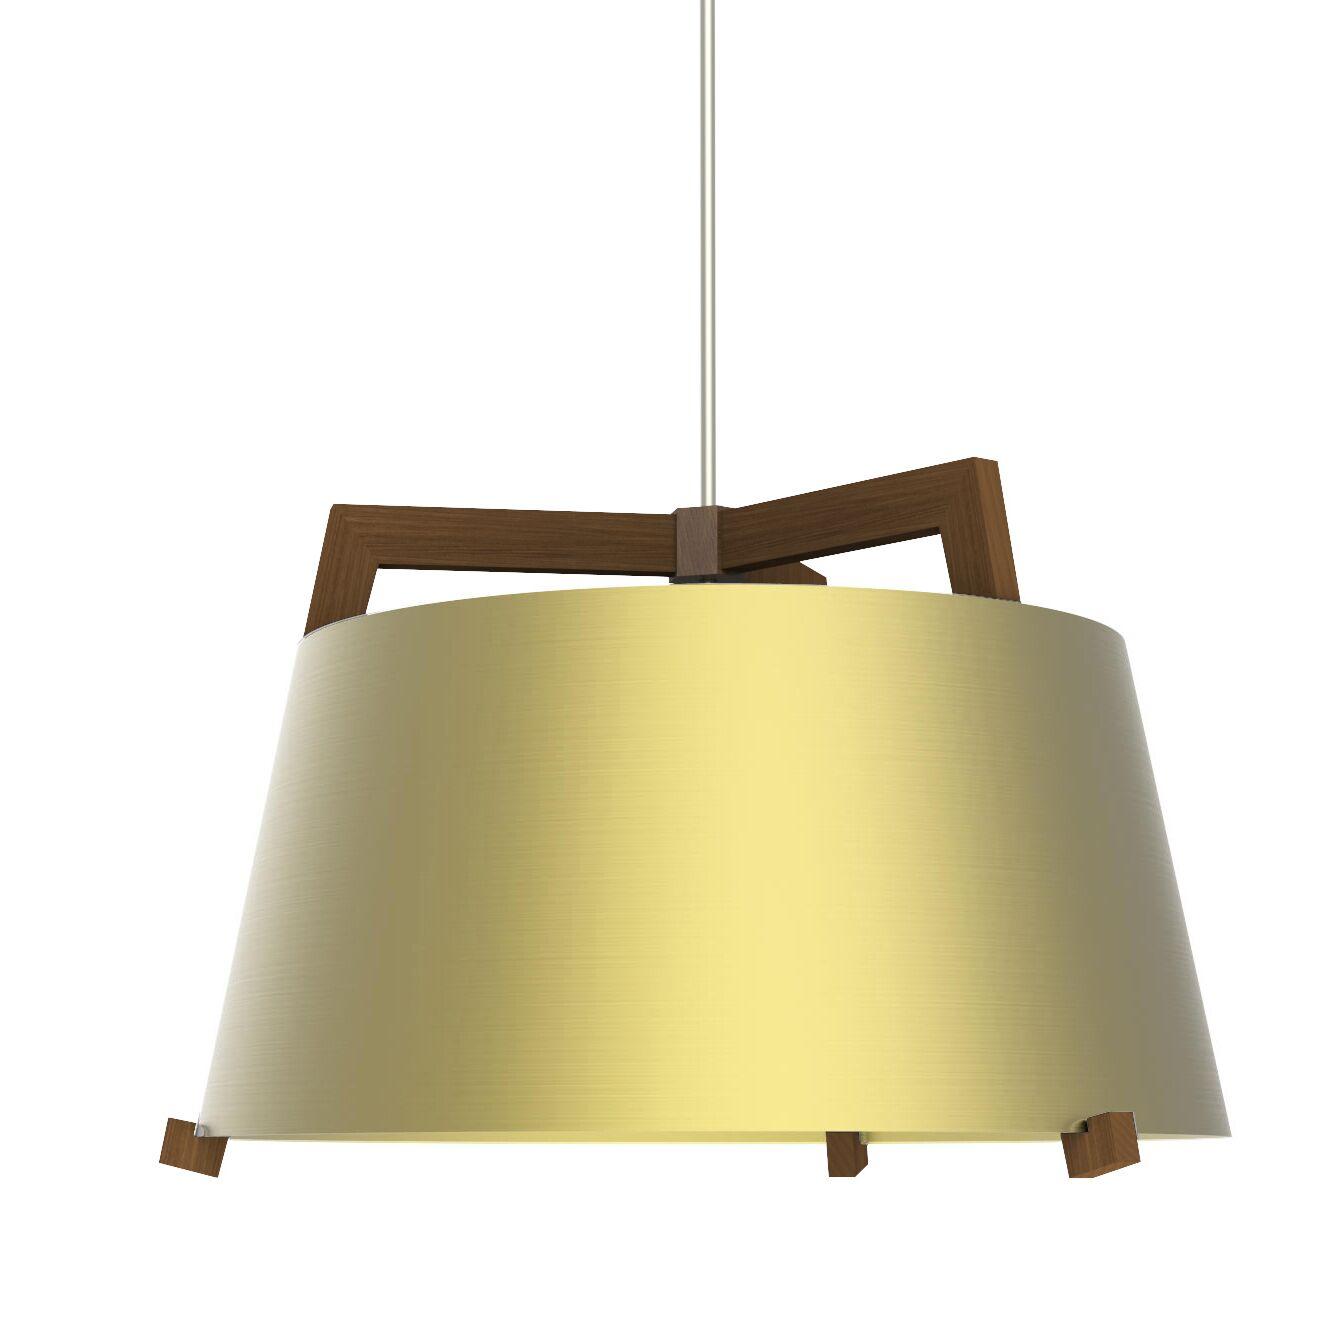 Ignis 1-Light  LED Drum Pendant Size: 11.5